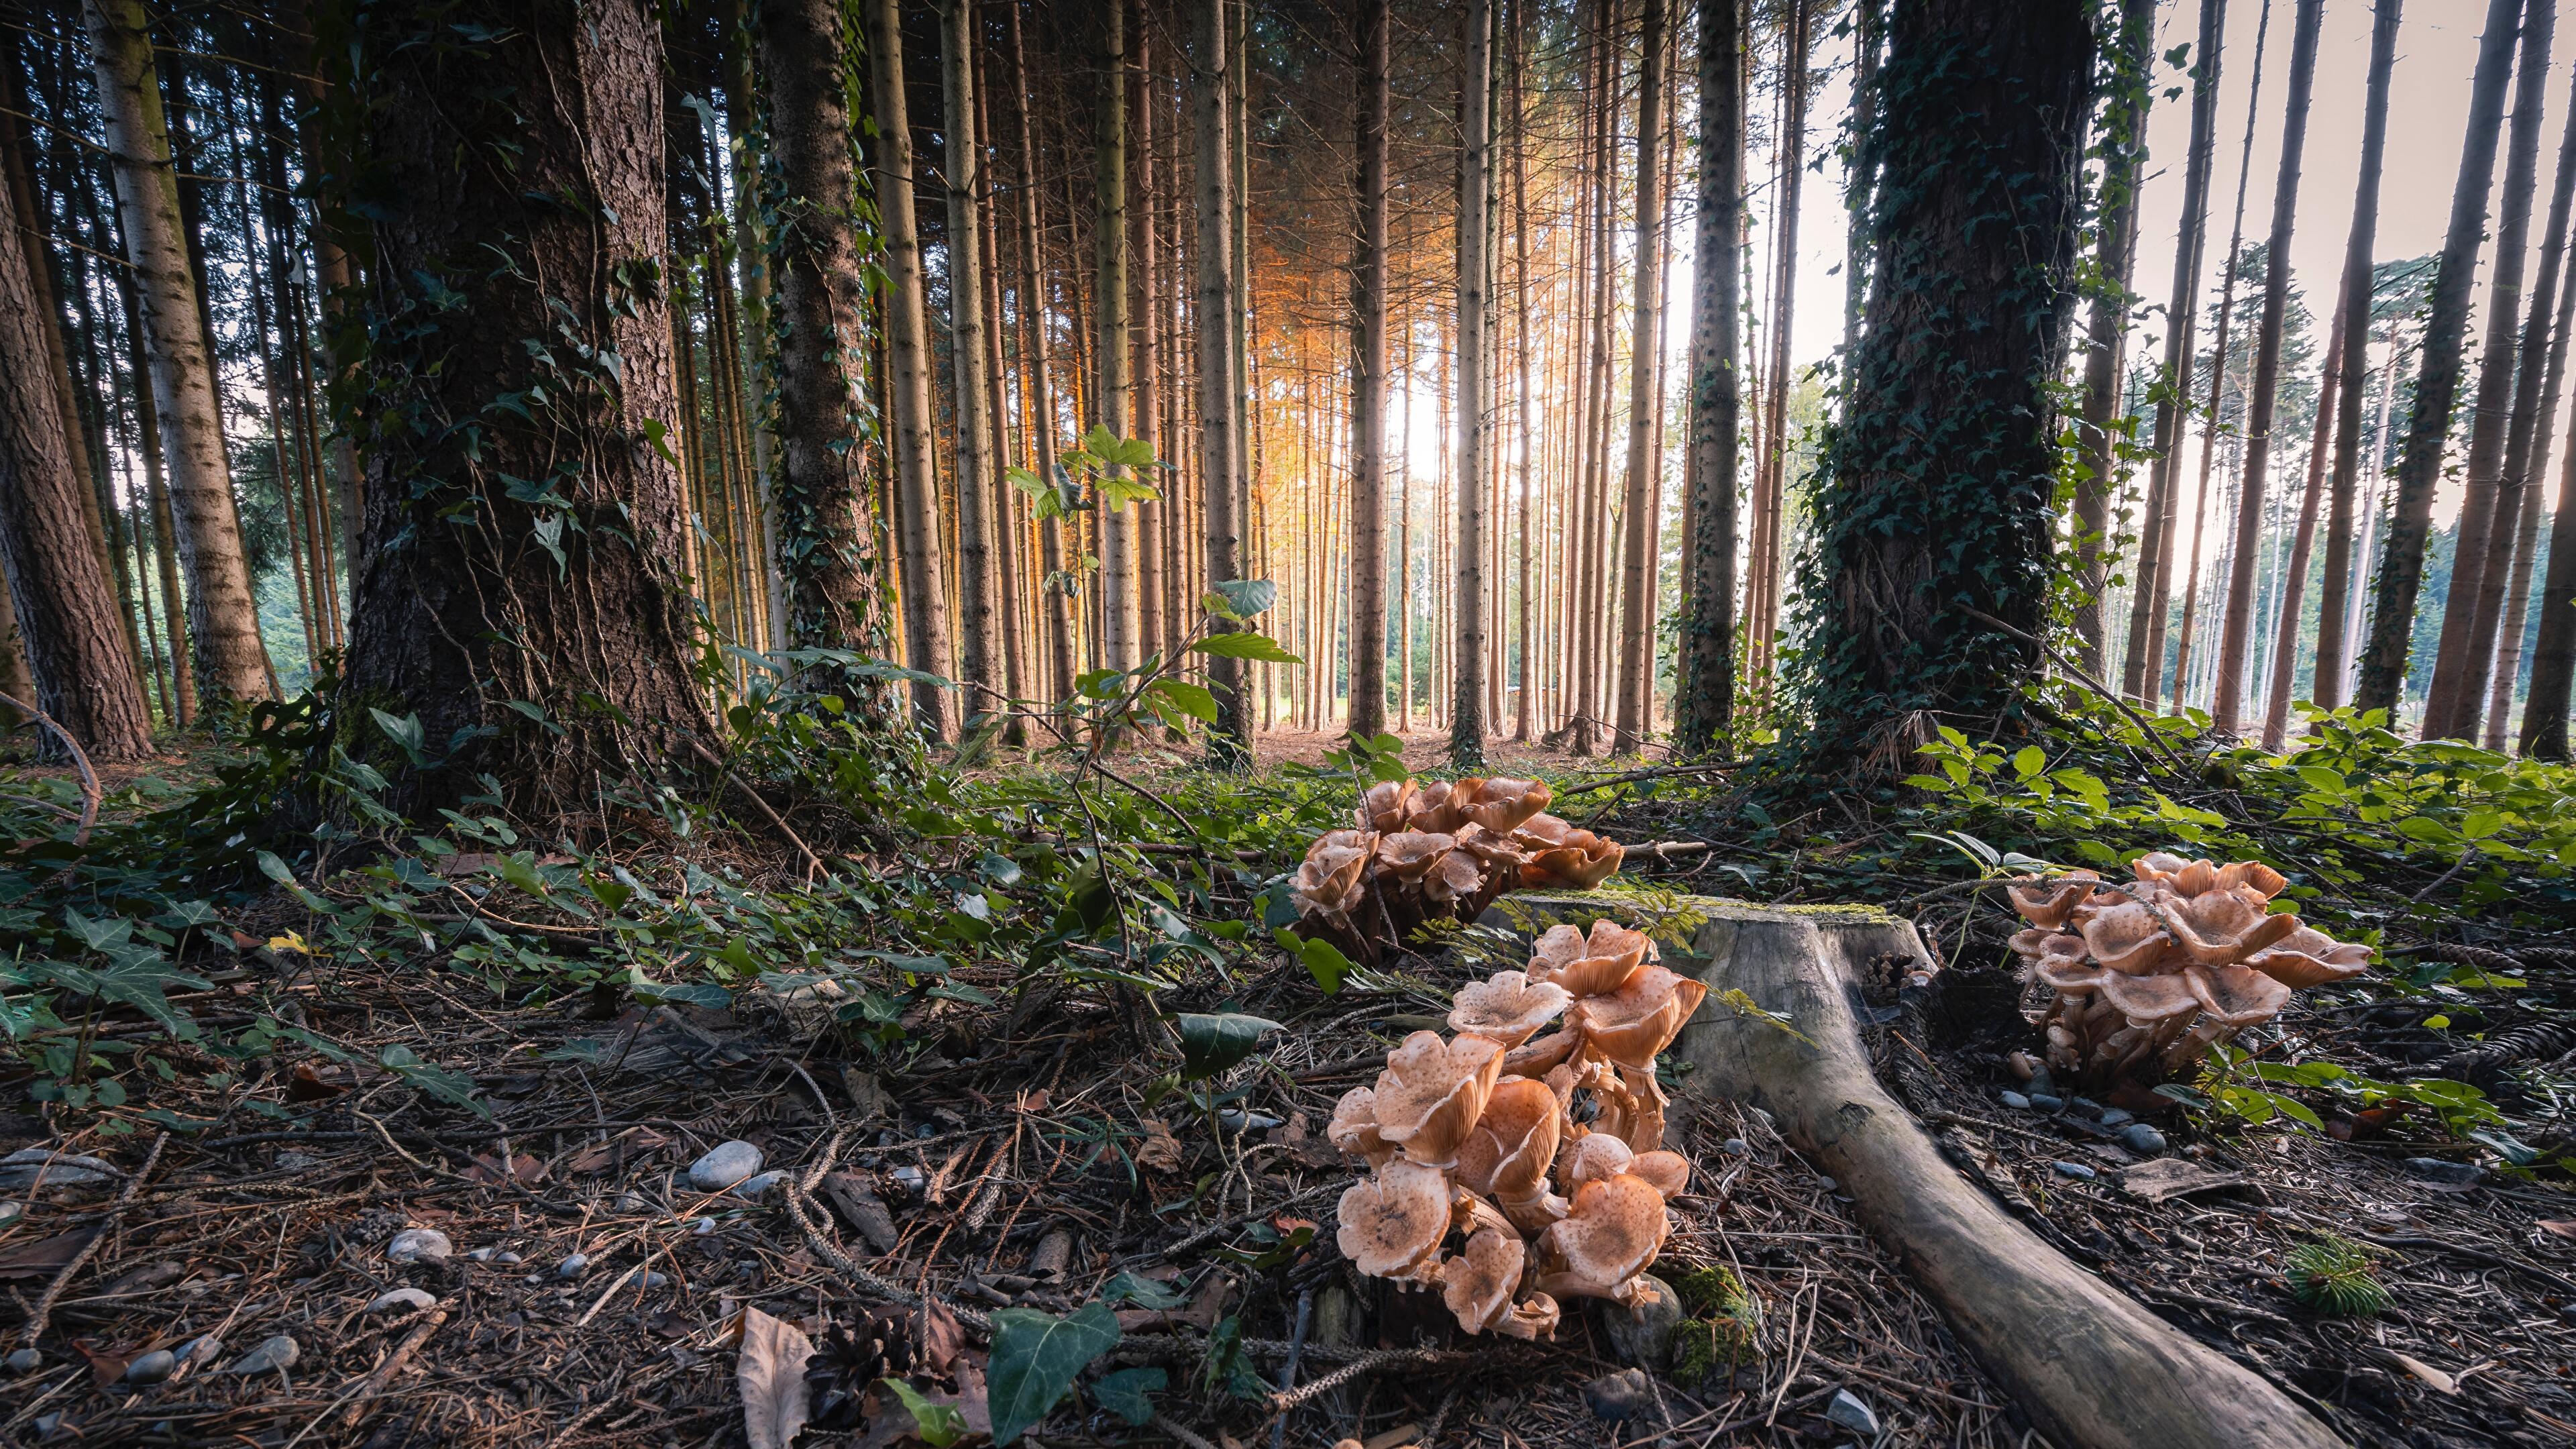 mushrooms in the forest frauenfeld switzerland wallpaper